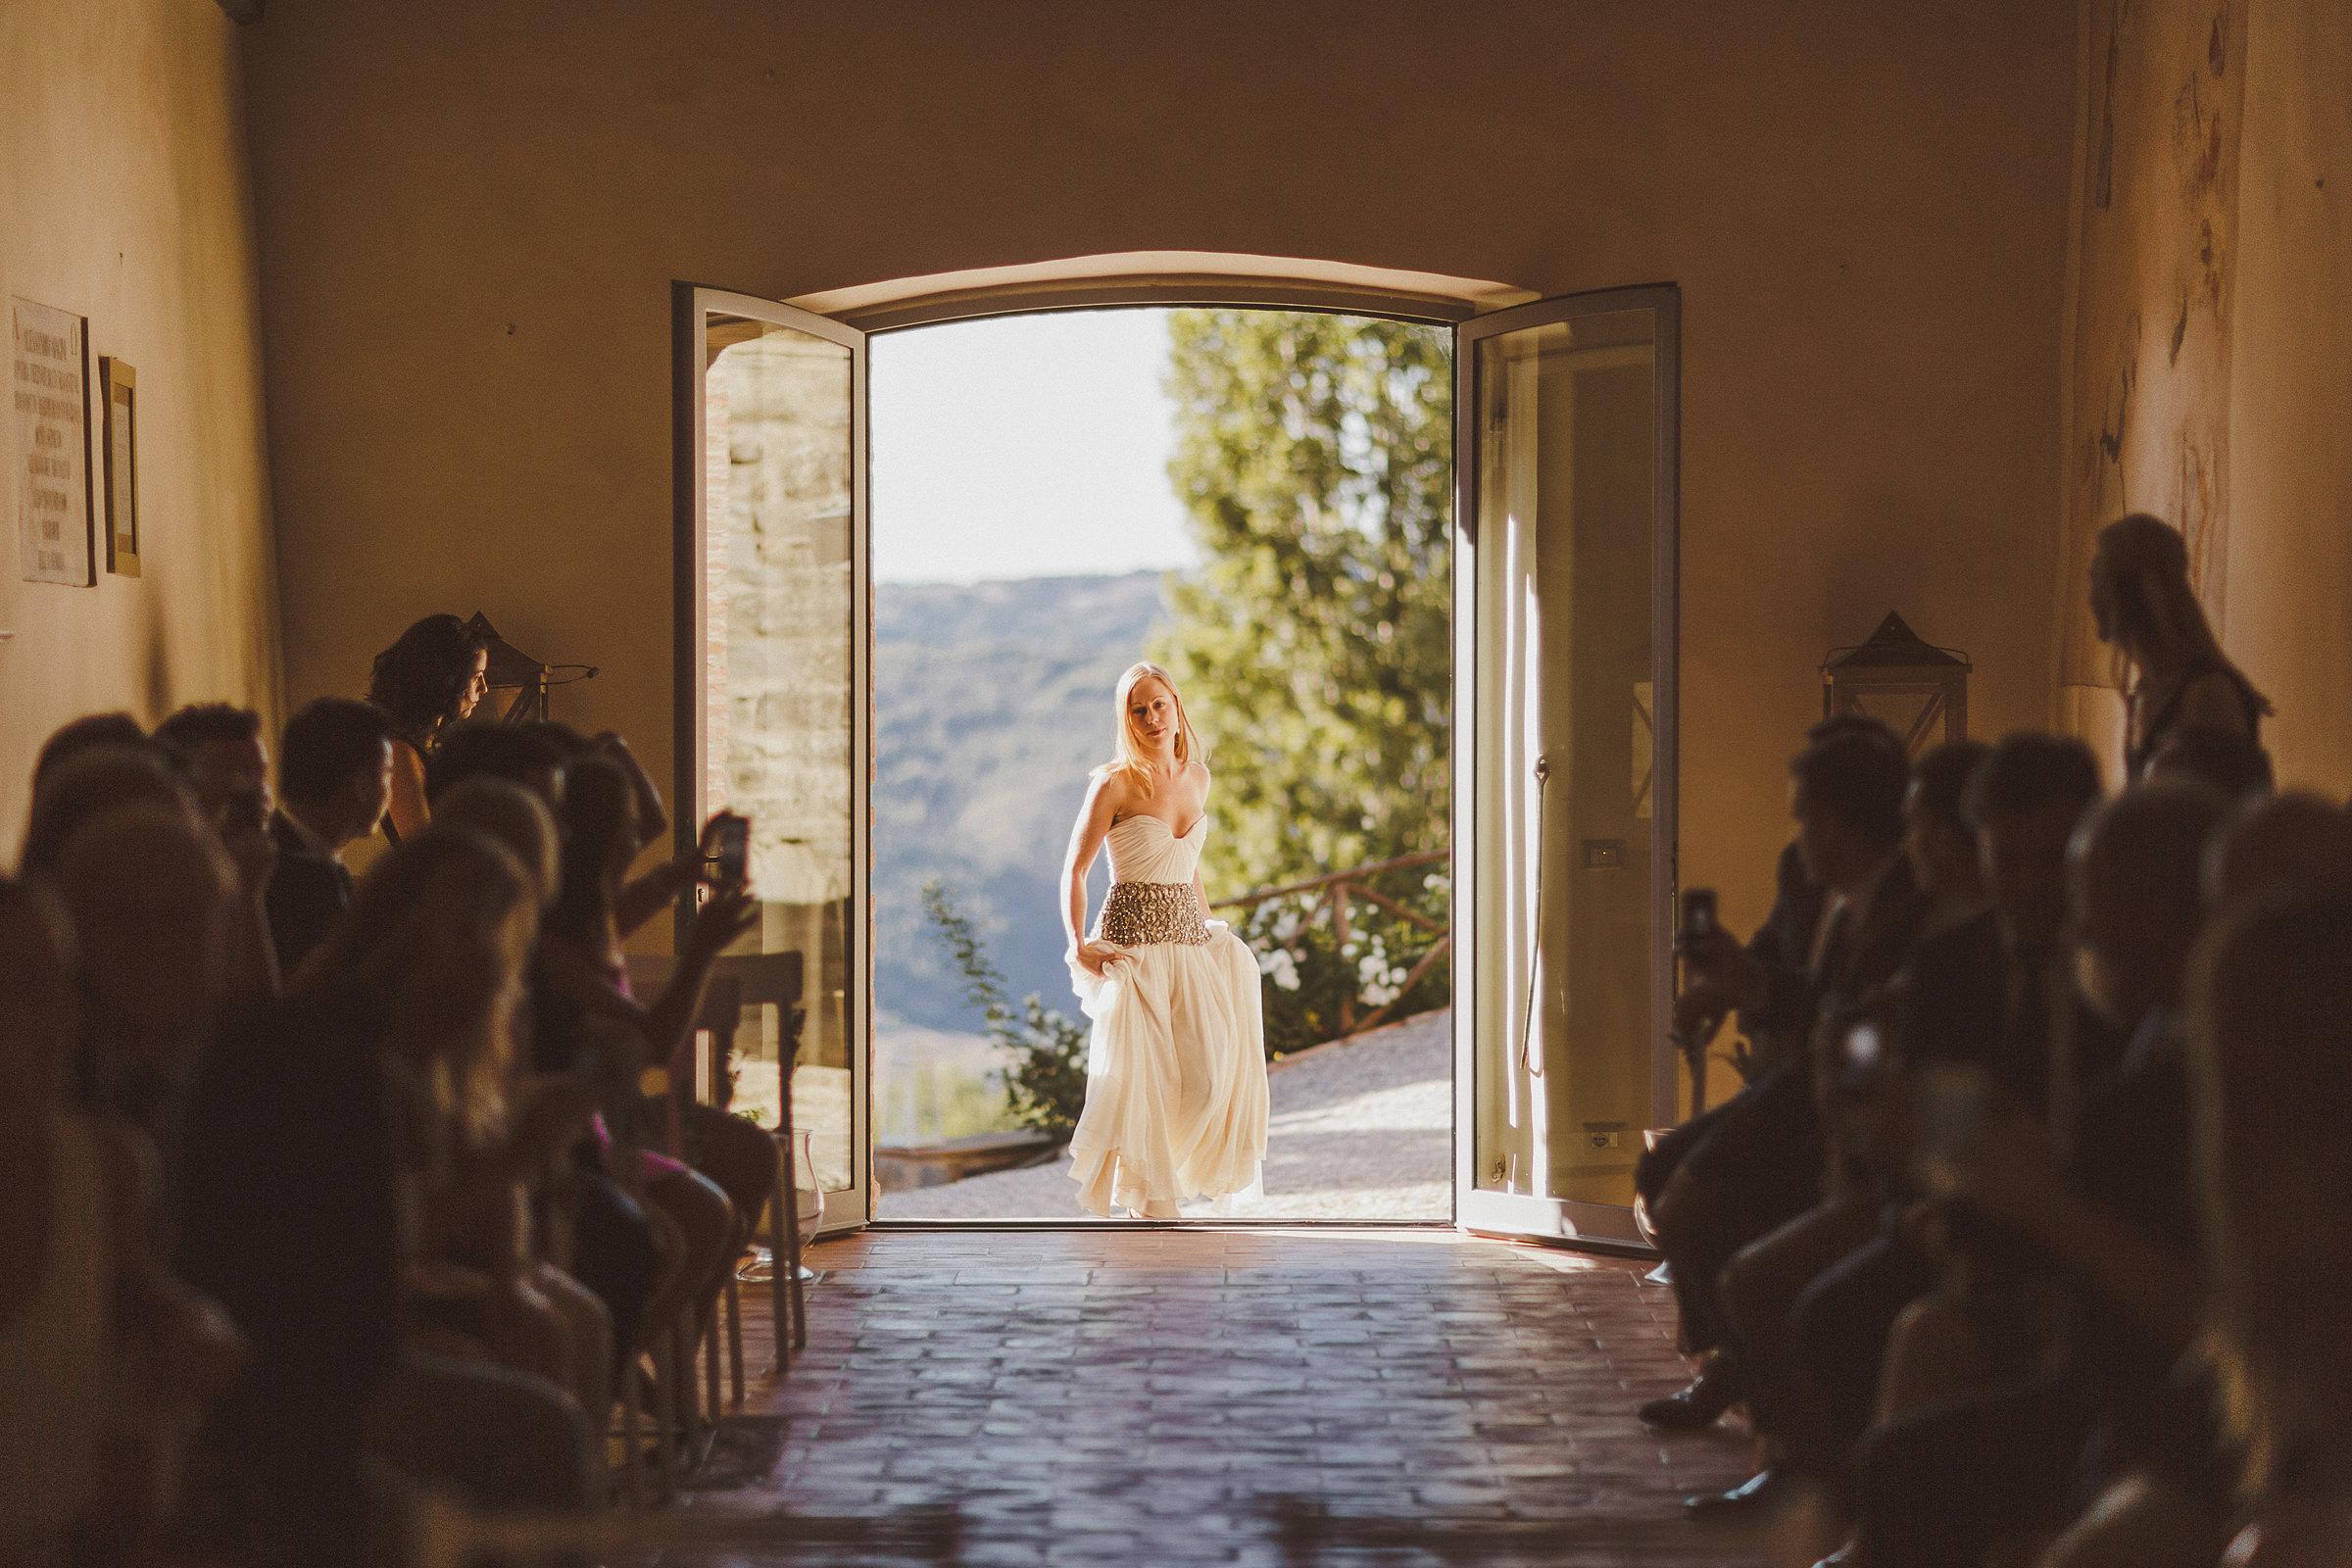 bride-entering-ceremony-hall-ed-peers-photography